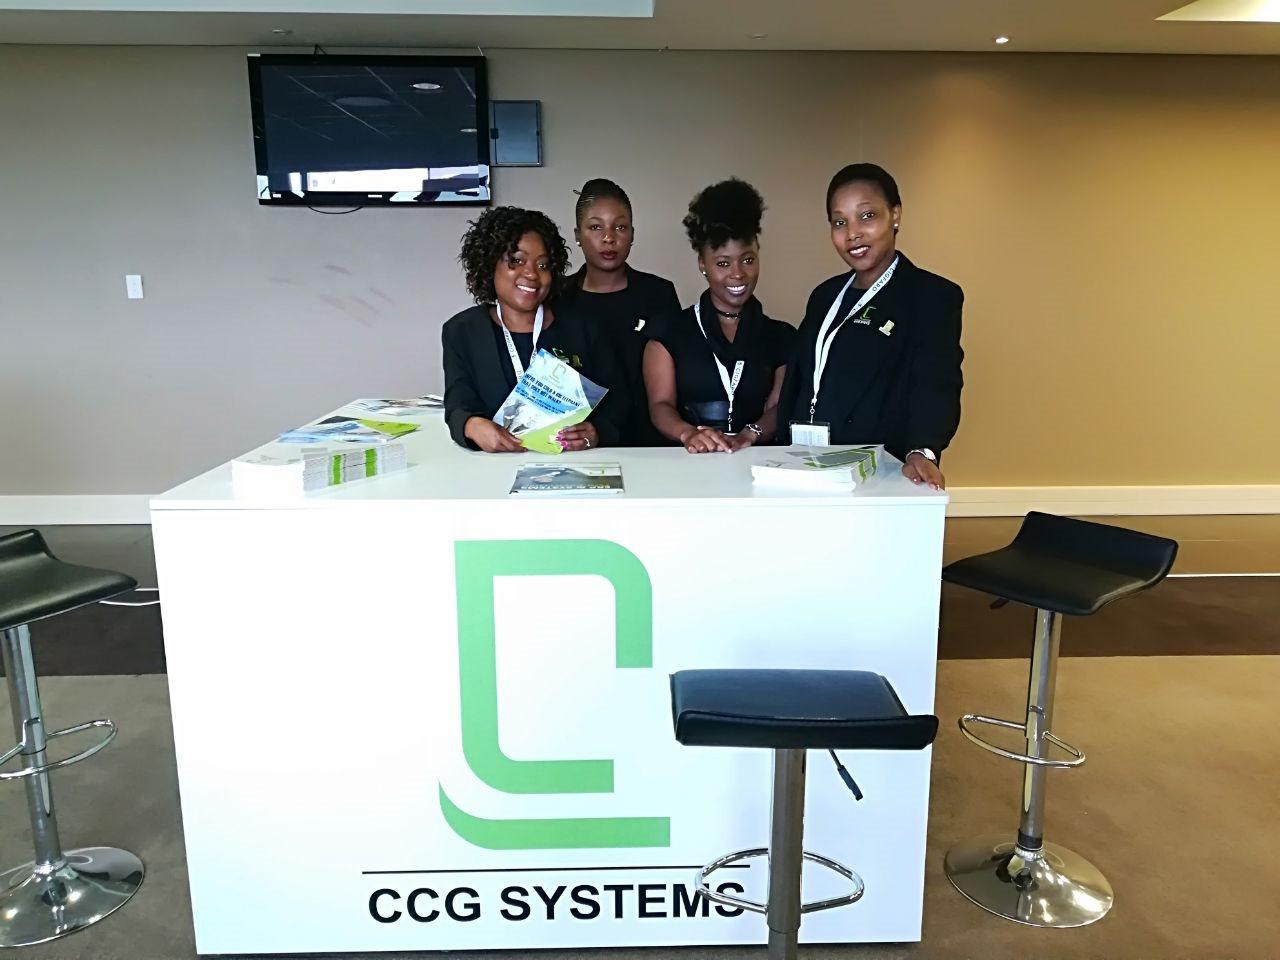 CCG Systems